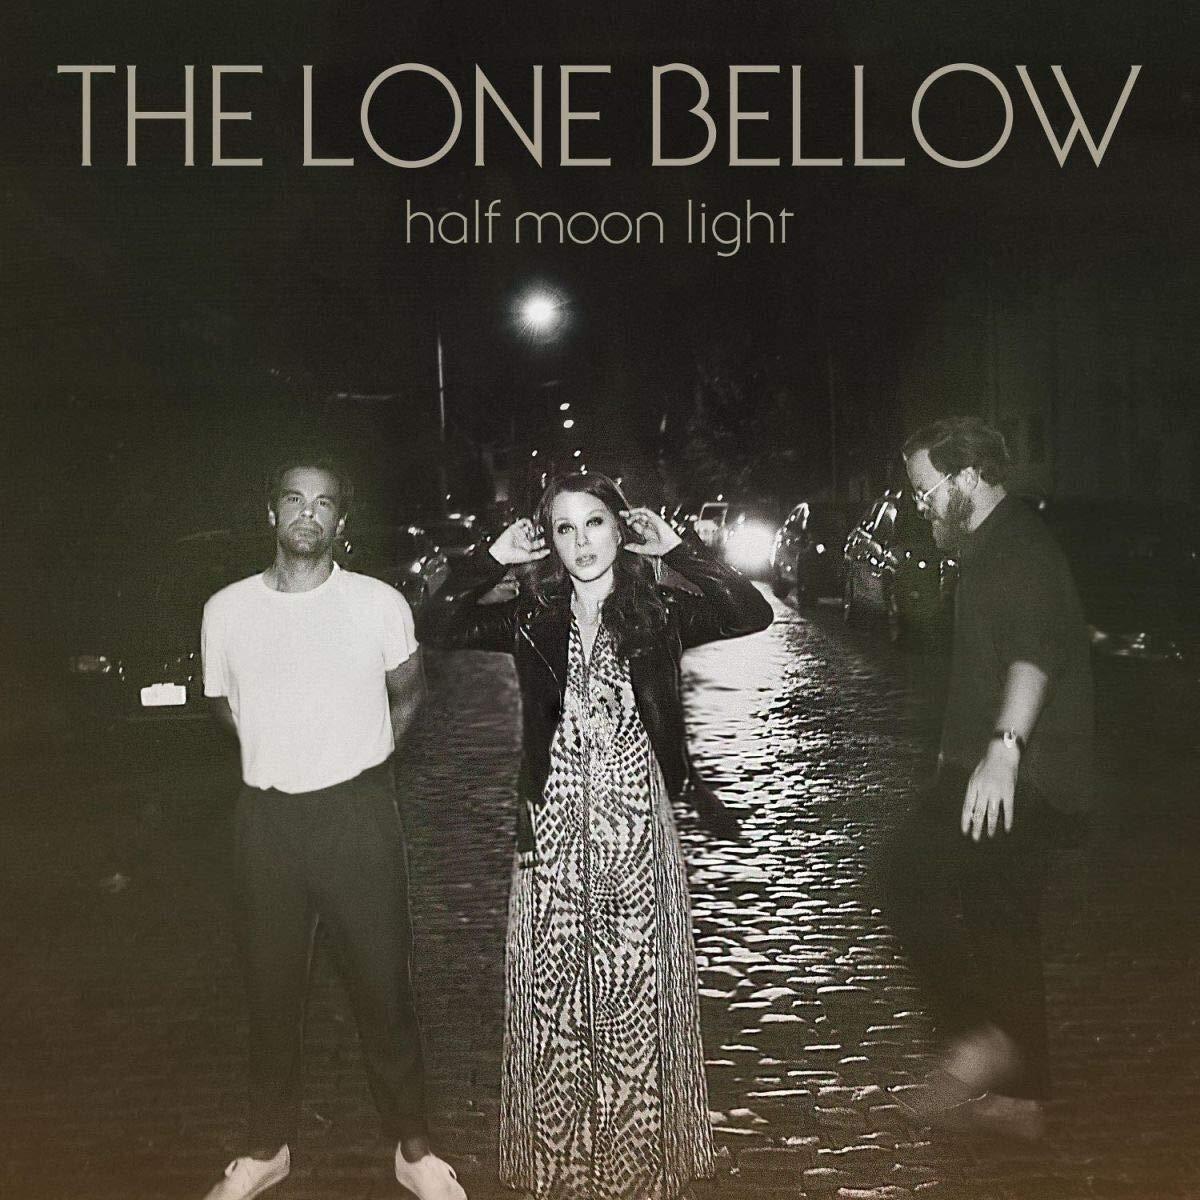 The Lone Bellow - Half Moon Light - Amazon.com Music